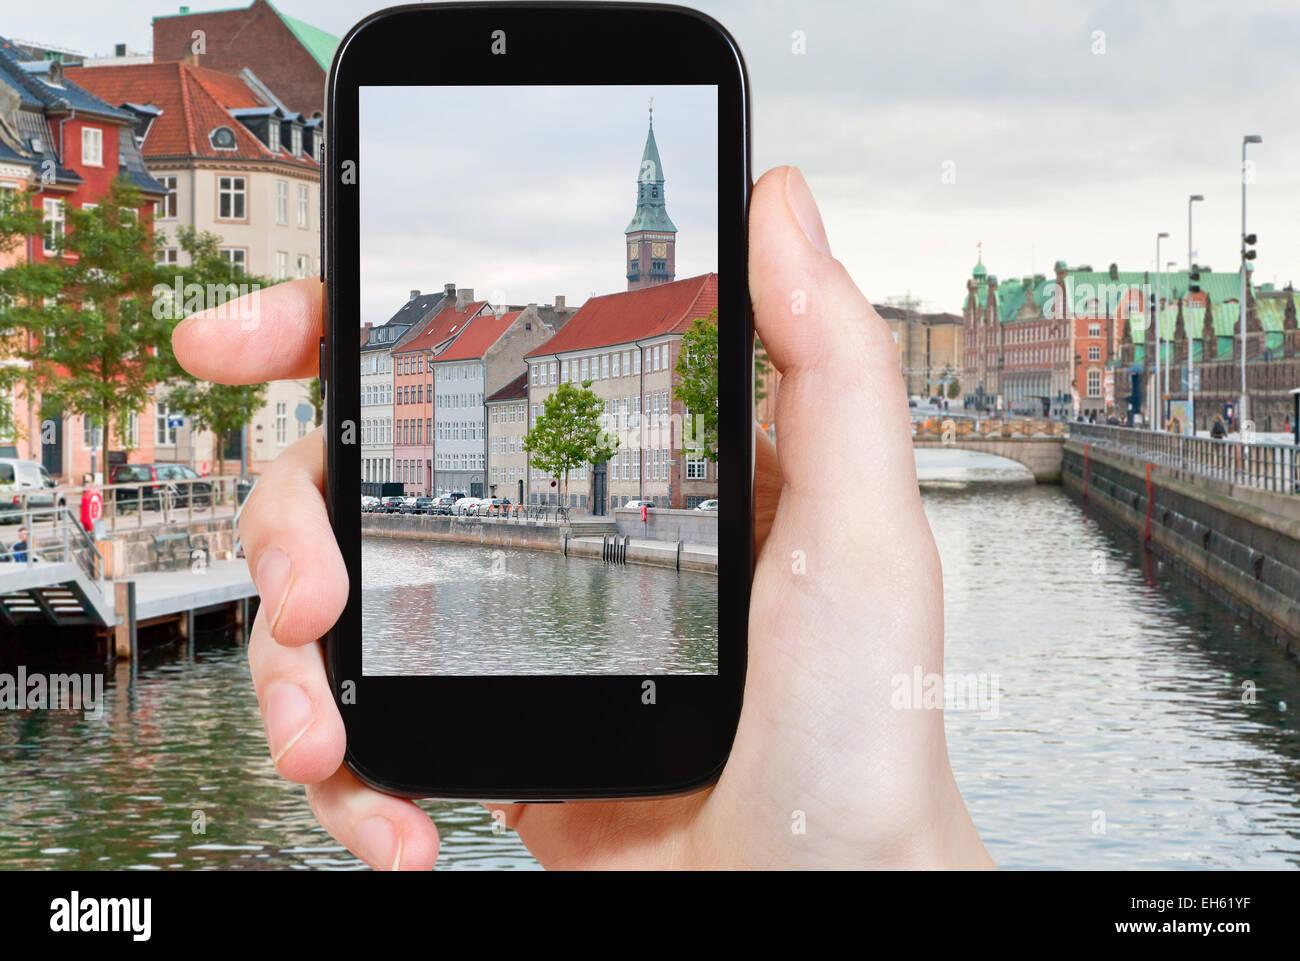 travel concept - tourist taking photo of Copenhagen cityscape on mobile gadget, Denmark - Stock Image